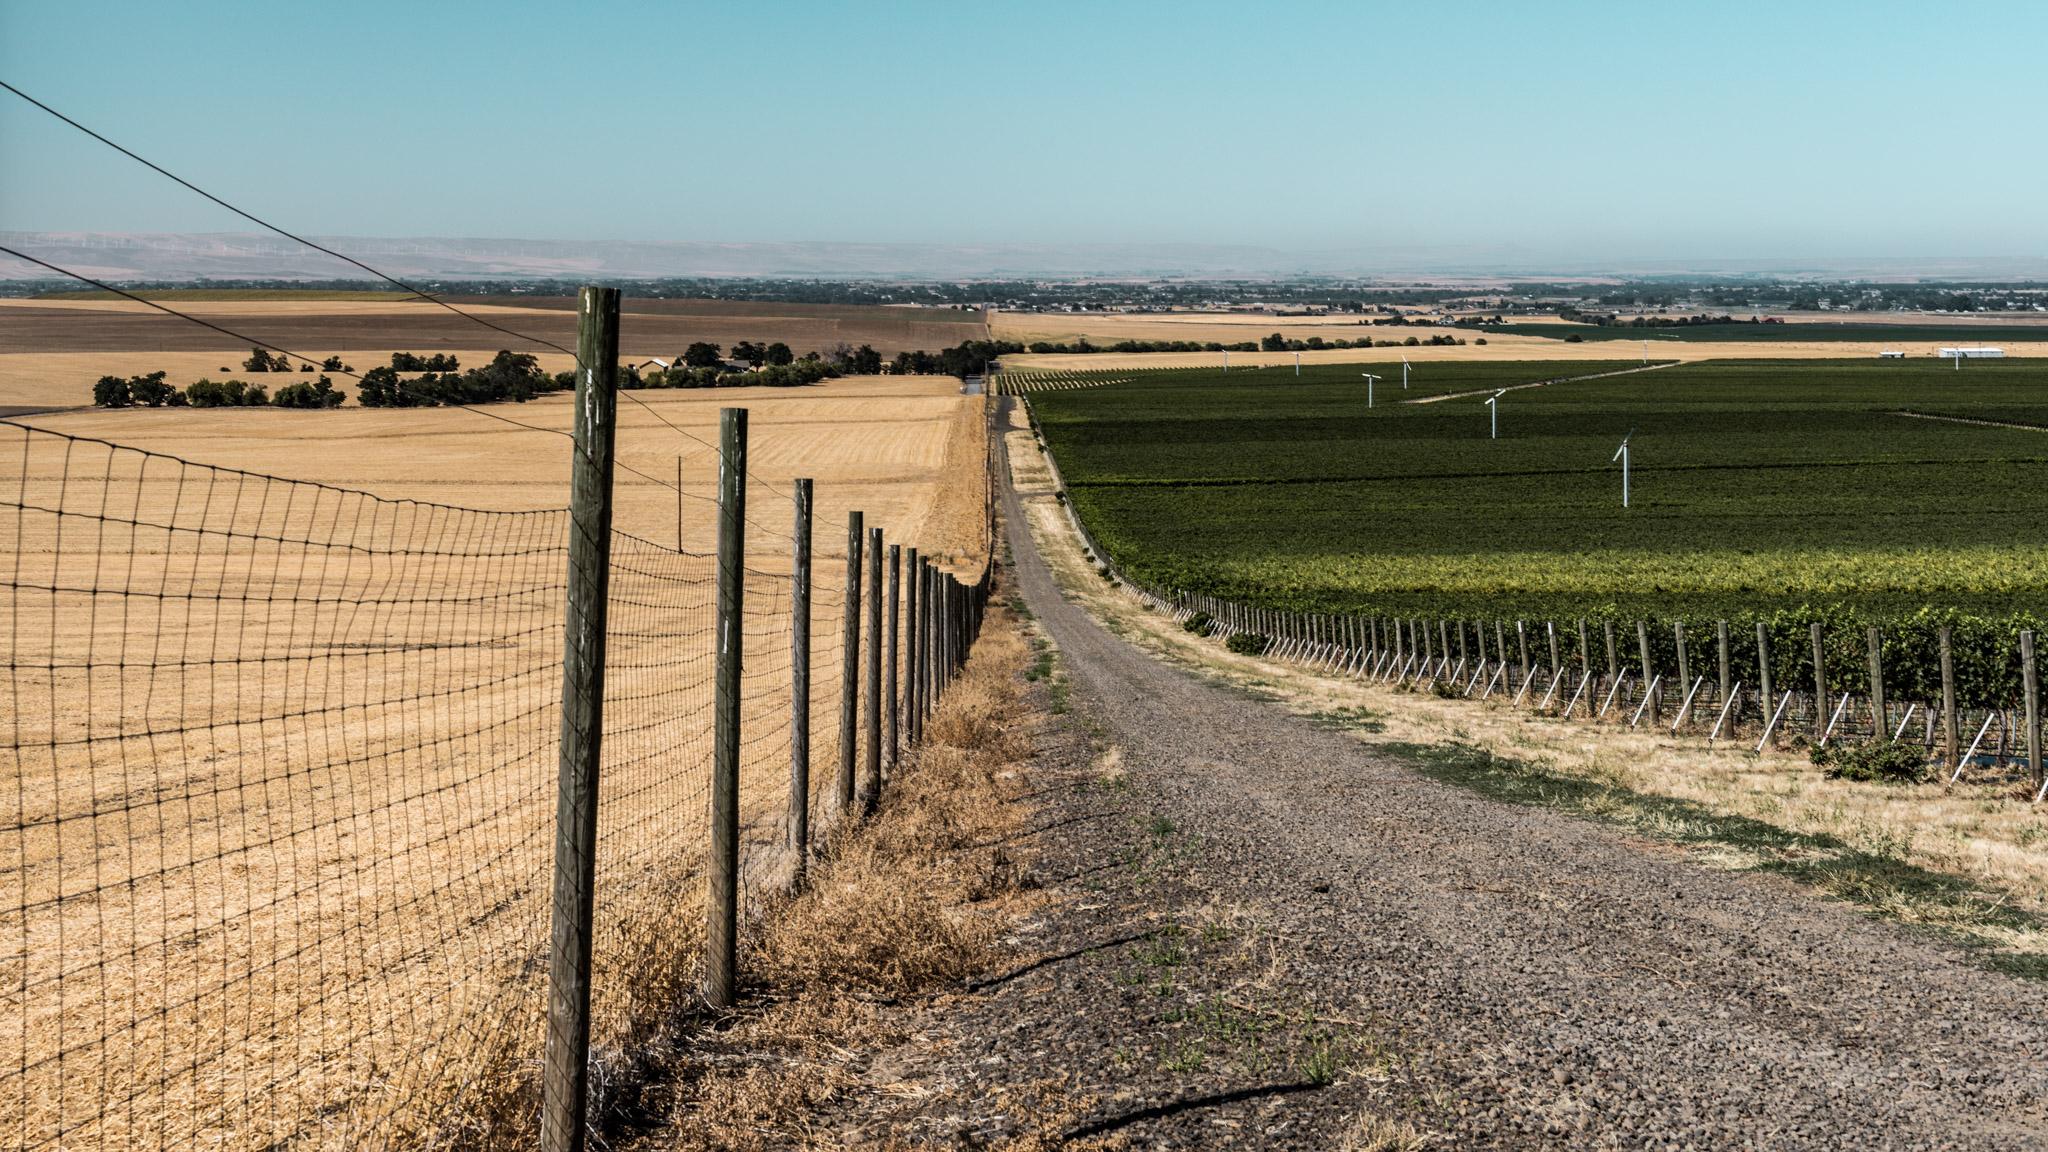 US : Washington : State Line Rd, Oregon on the left and Washington on the right